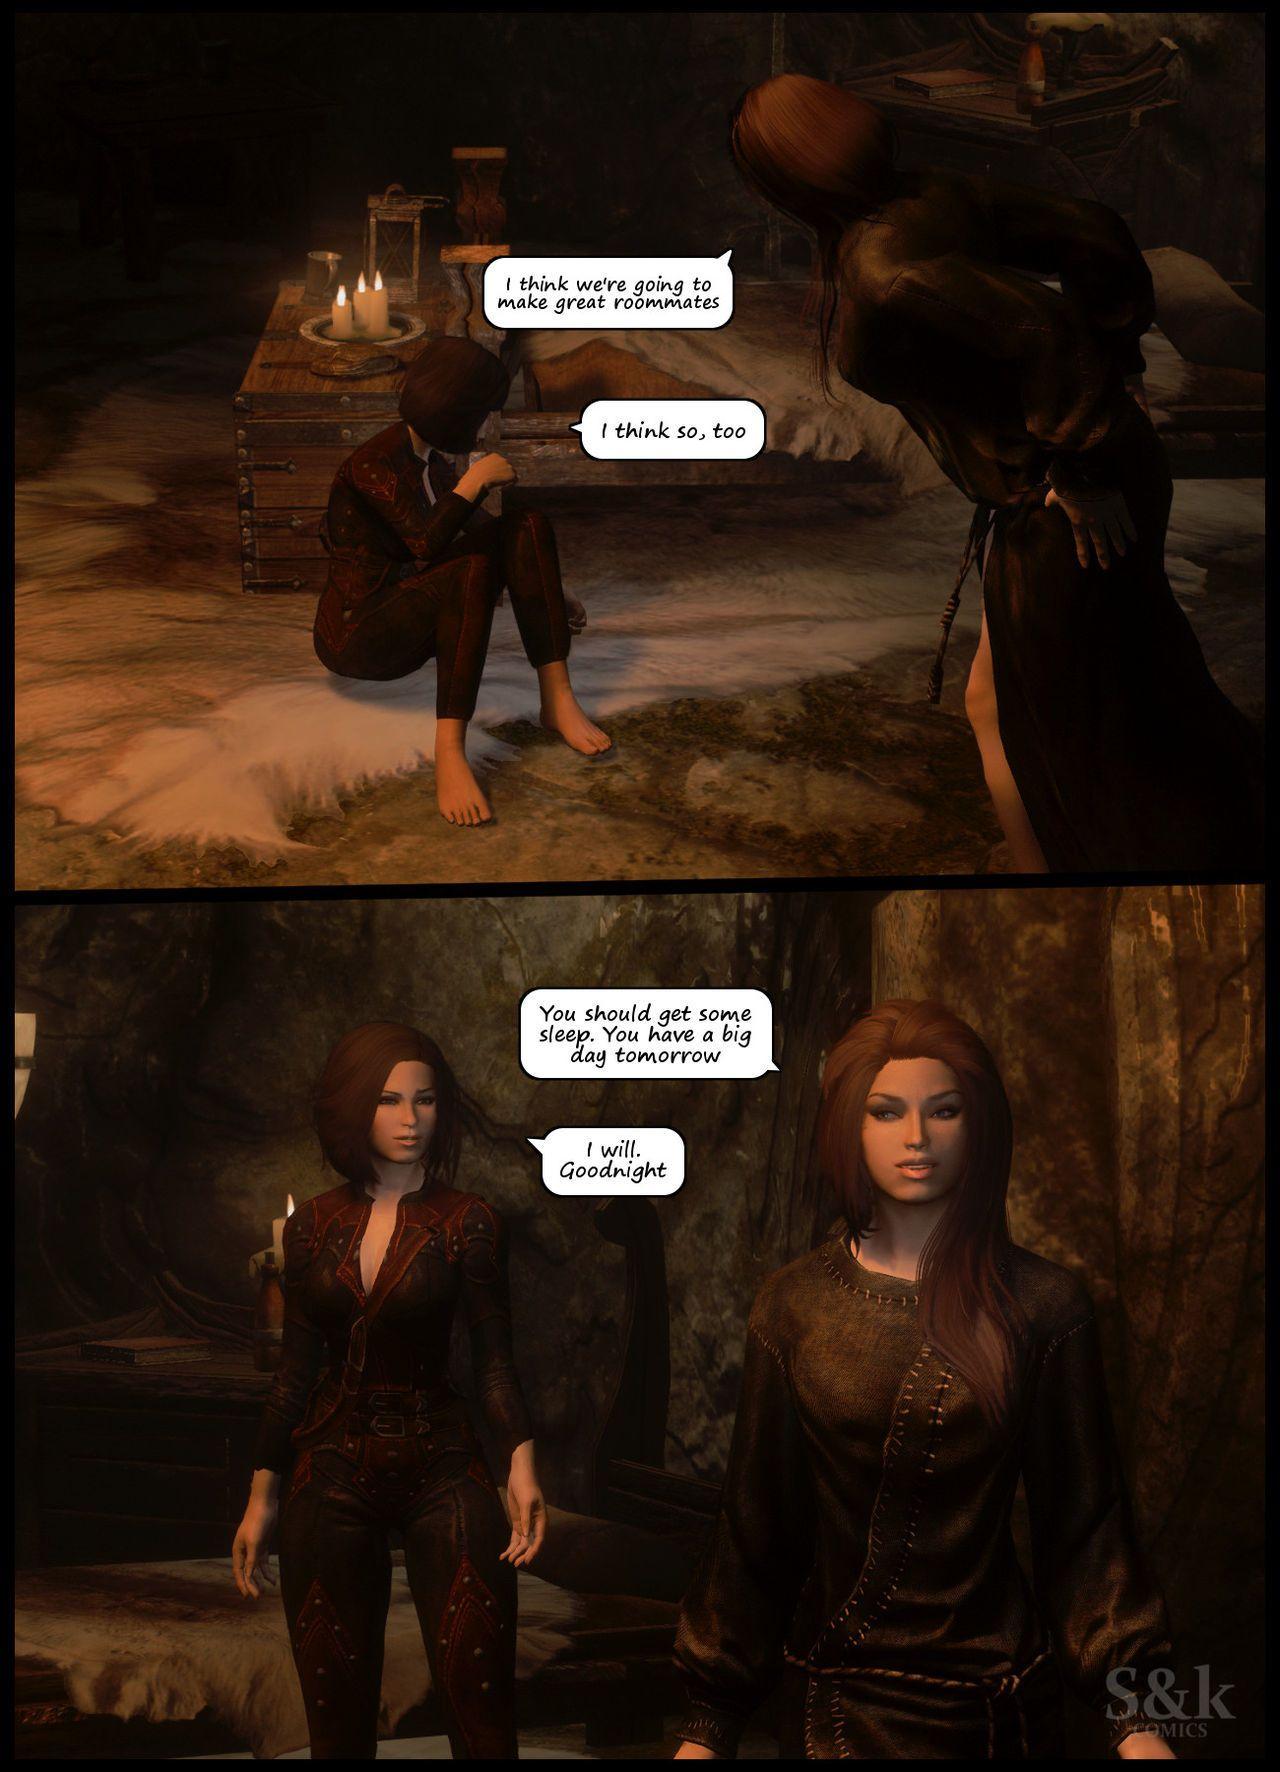 Khajitwoman Chapter 3 - SKcomics - part 5